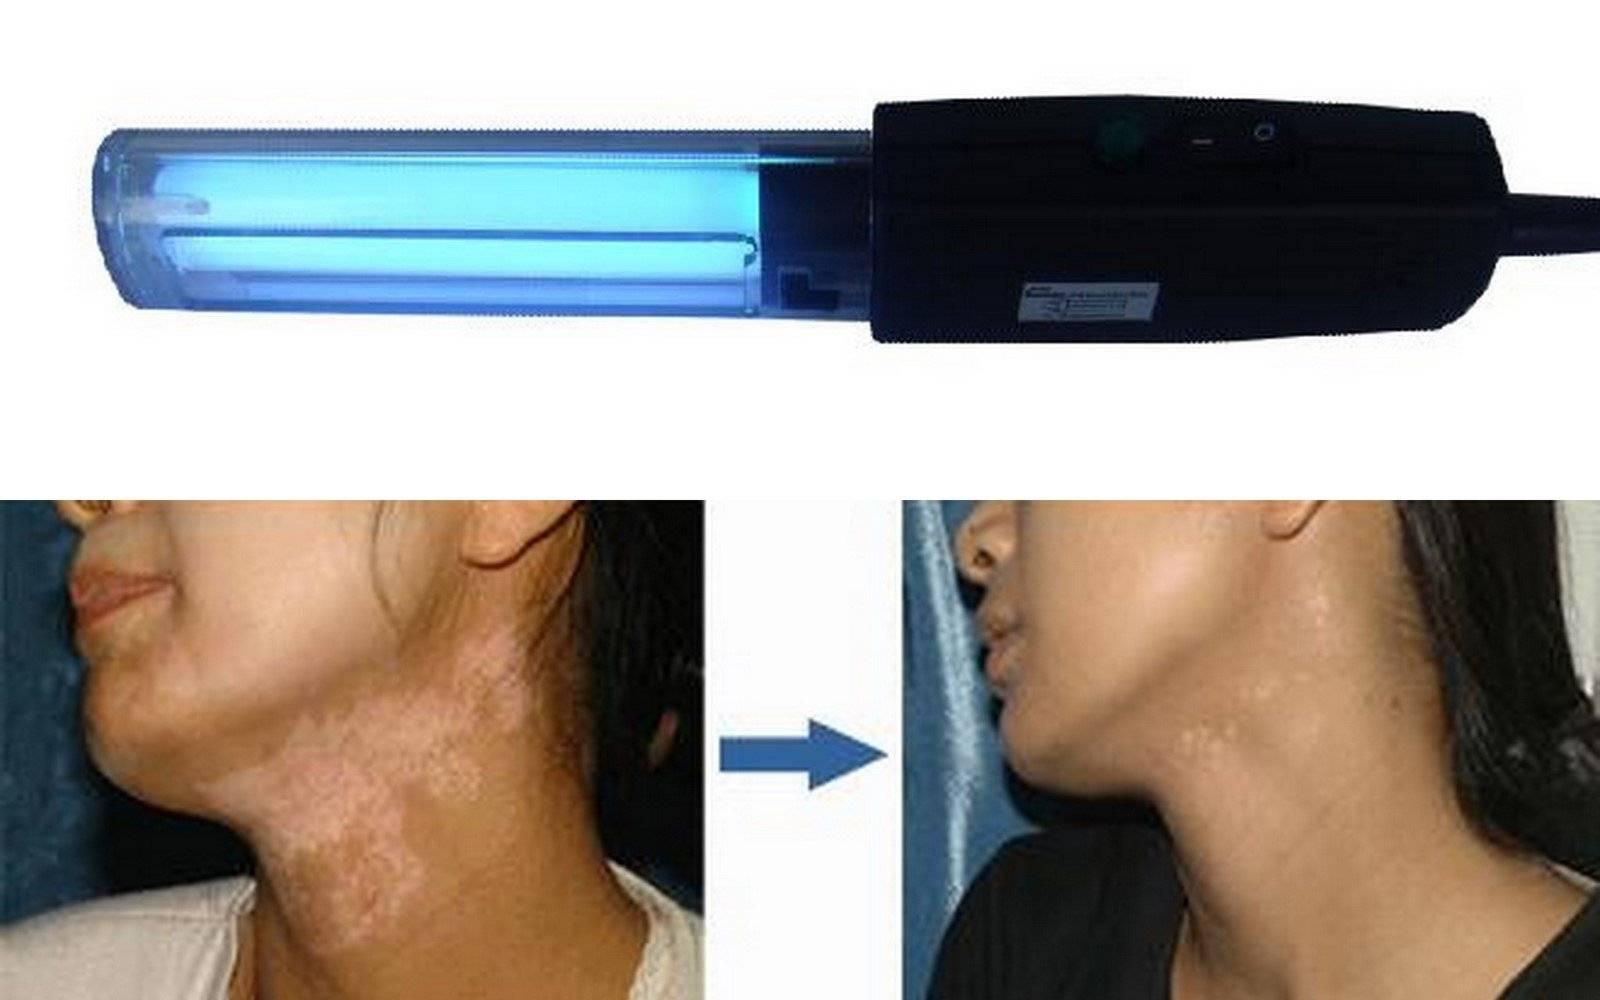 311nm narrow band uvb lamp for vitiligo